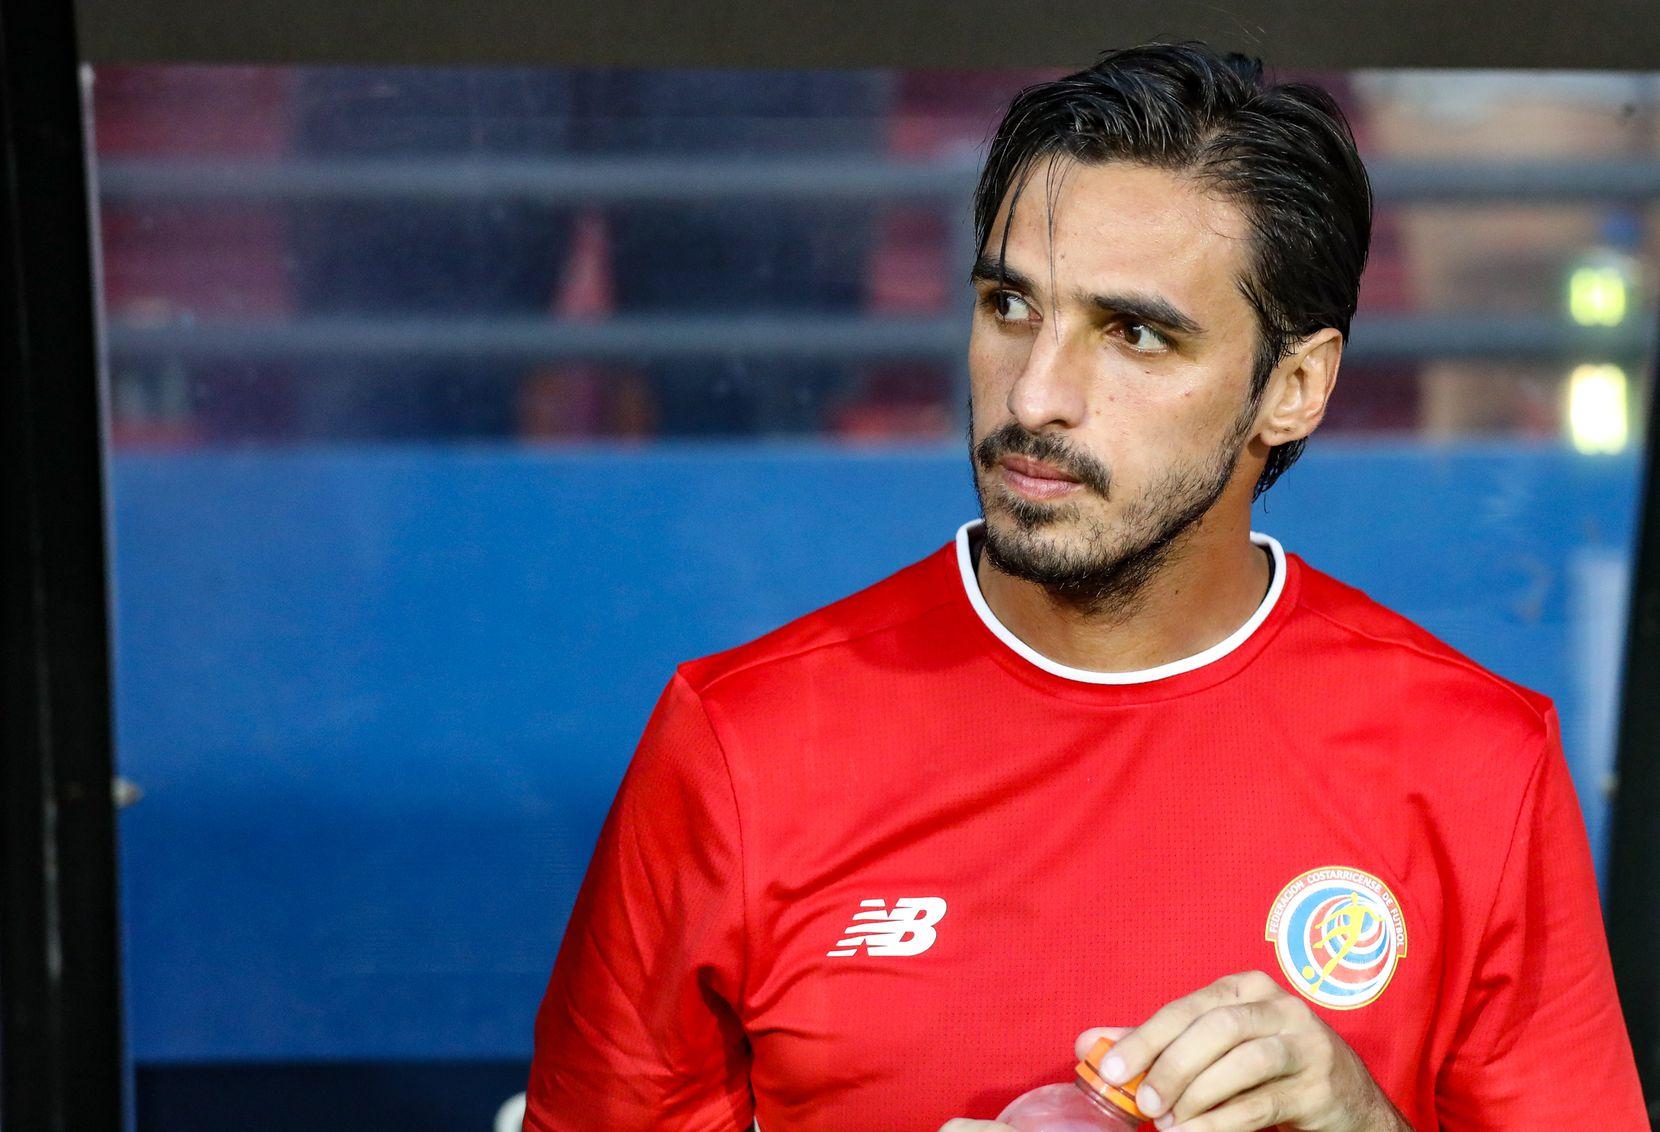 Bryan Ruiz awaits the start of the 2019 Gold Cup match between Costa Rica and Bermuda at Toyota Stadium. (6-20-19)